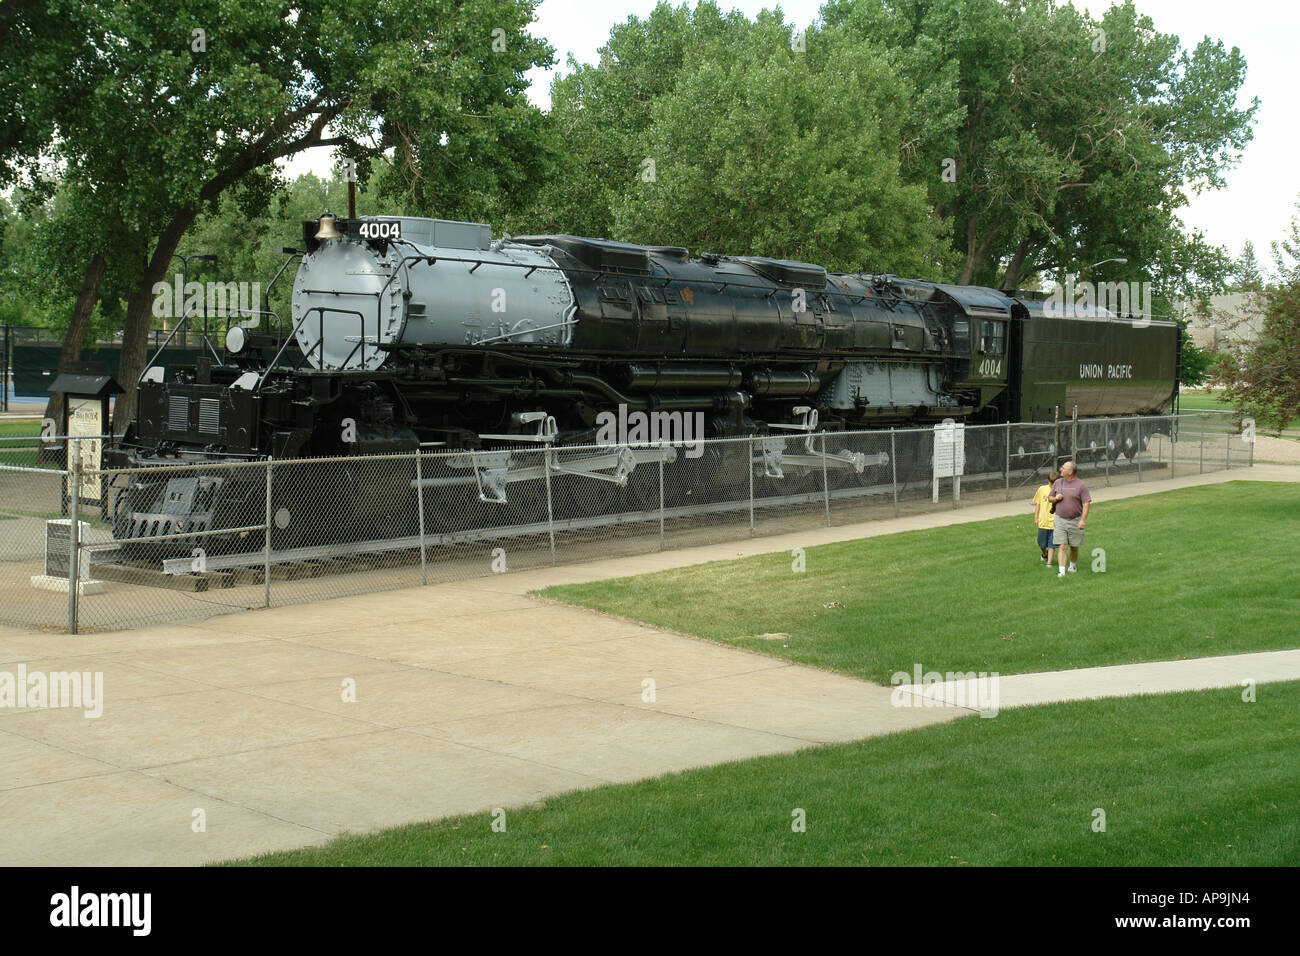 AJD50309, Cheyenne, WY, Wyoming, Holliday Park, Big Boy steam engine, locomotive Stock Photo